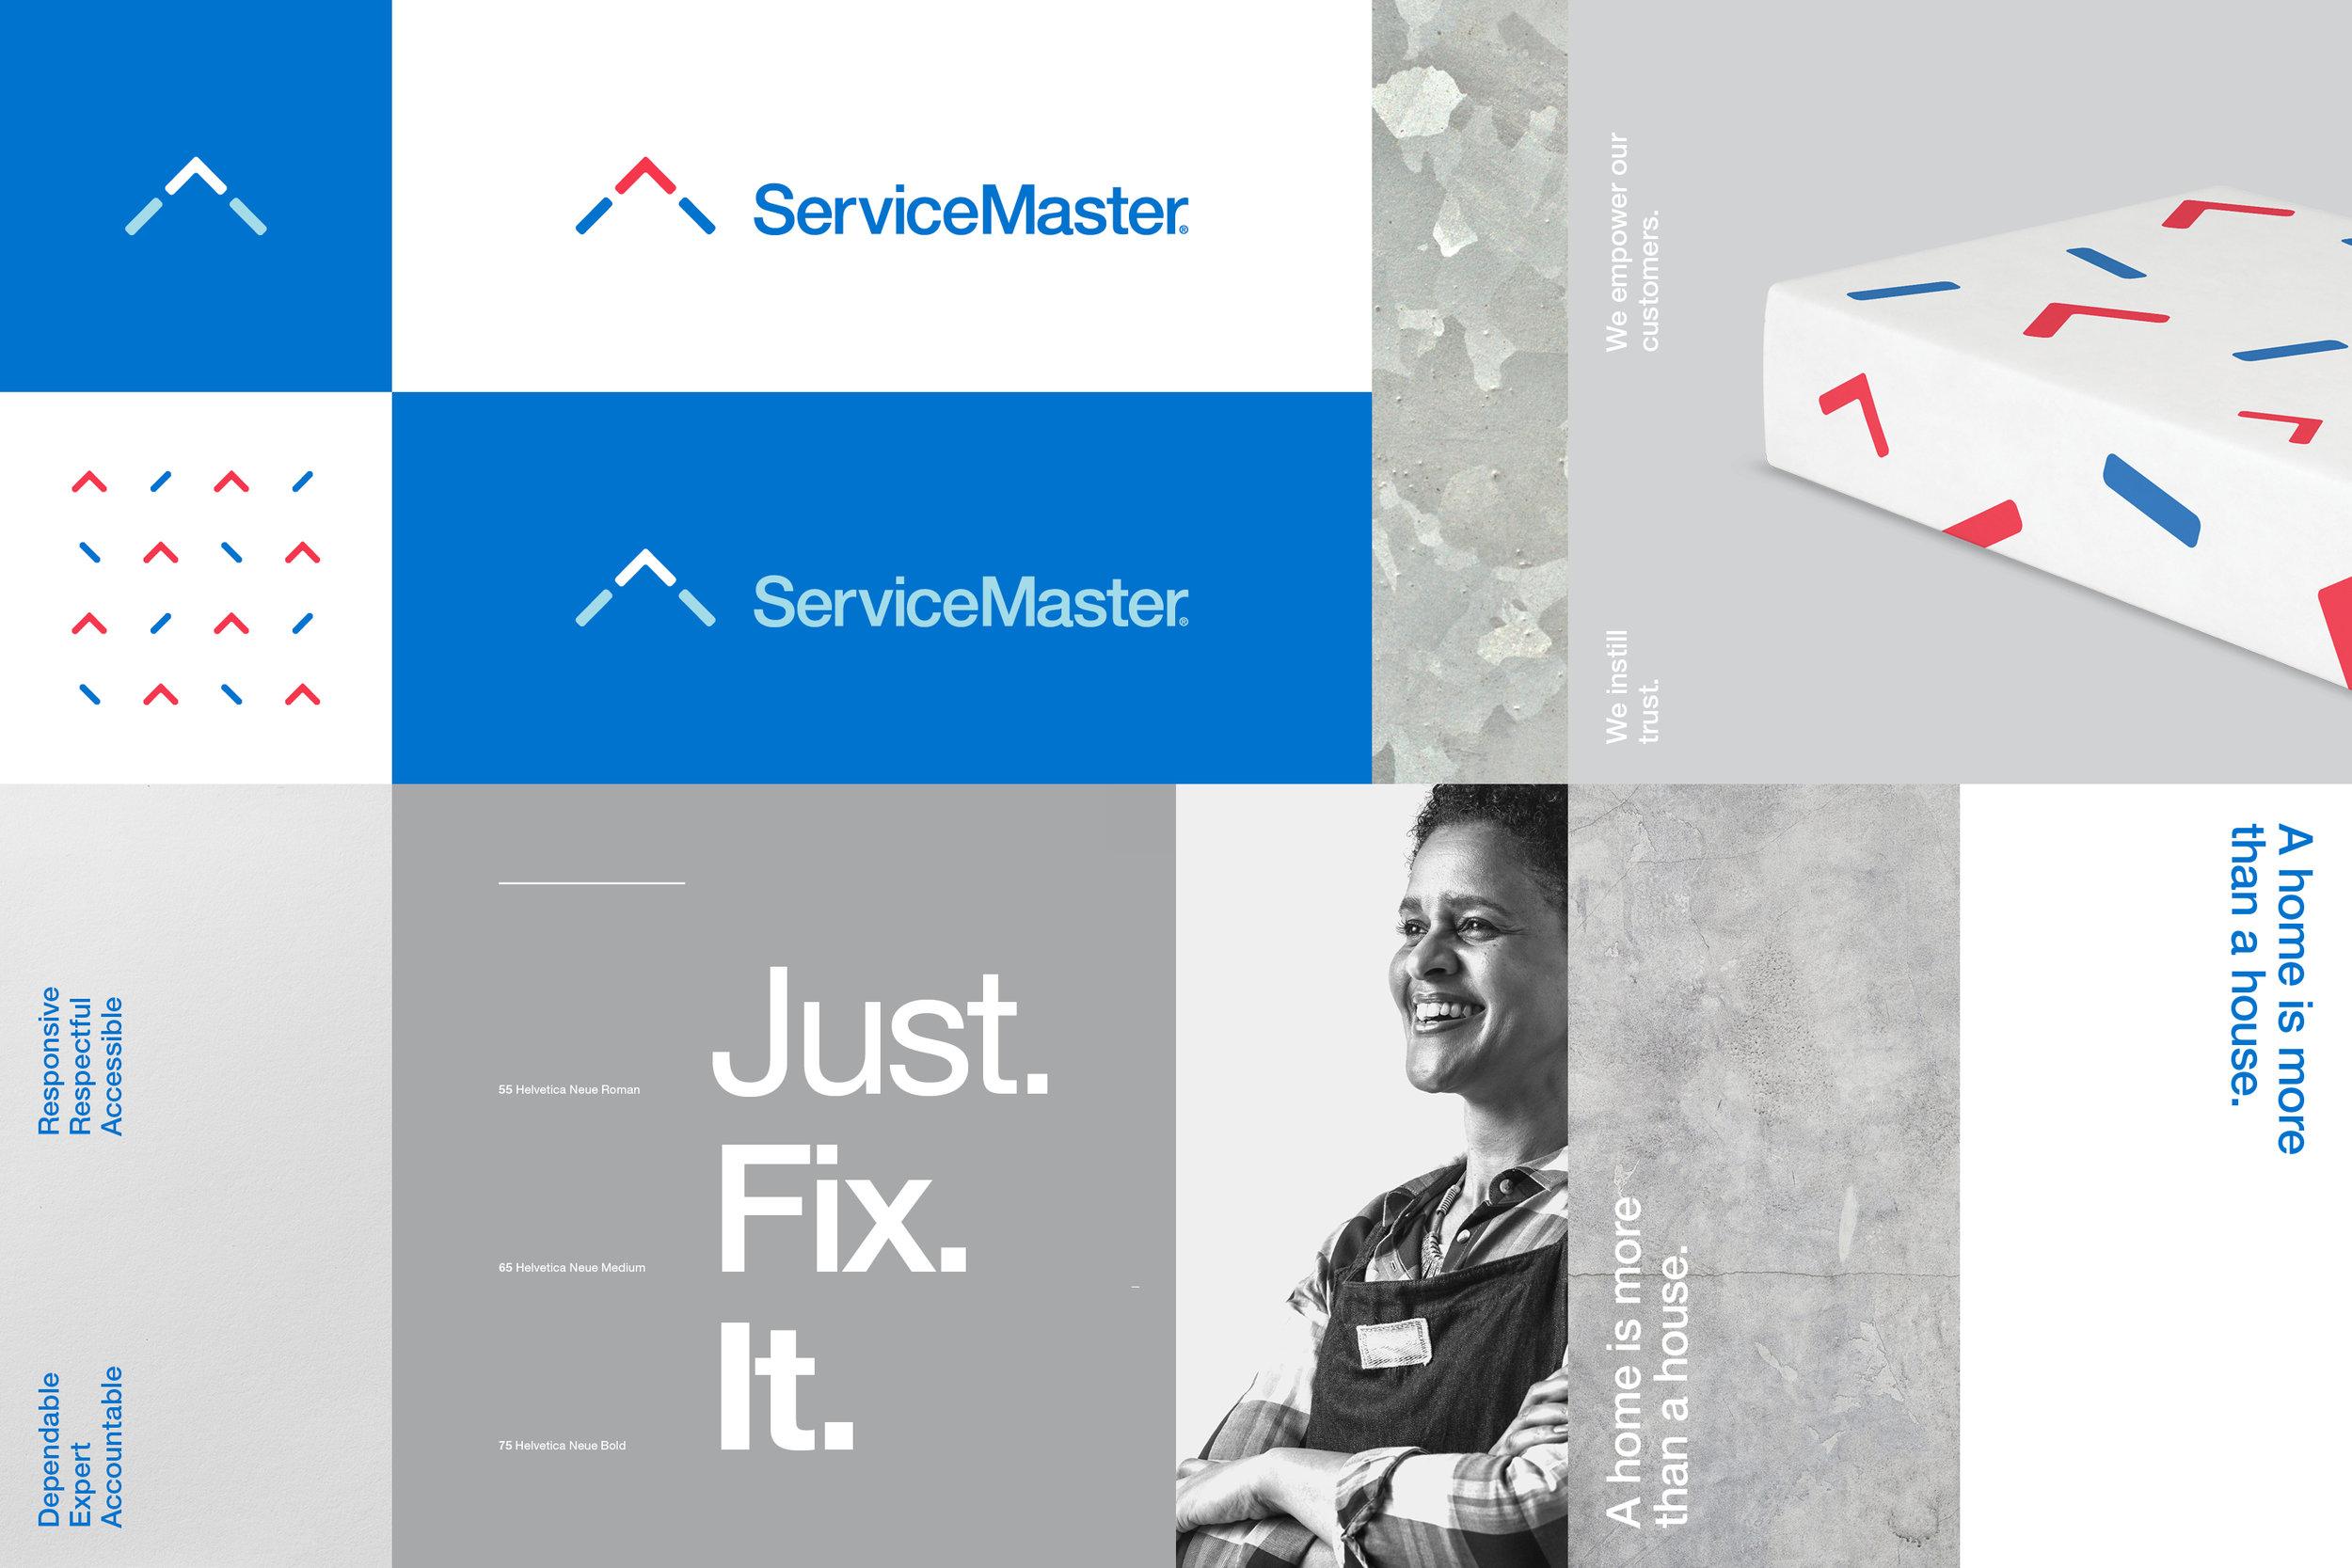 ServiceMaster_3000_20005.jpg